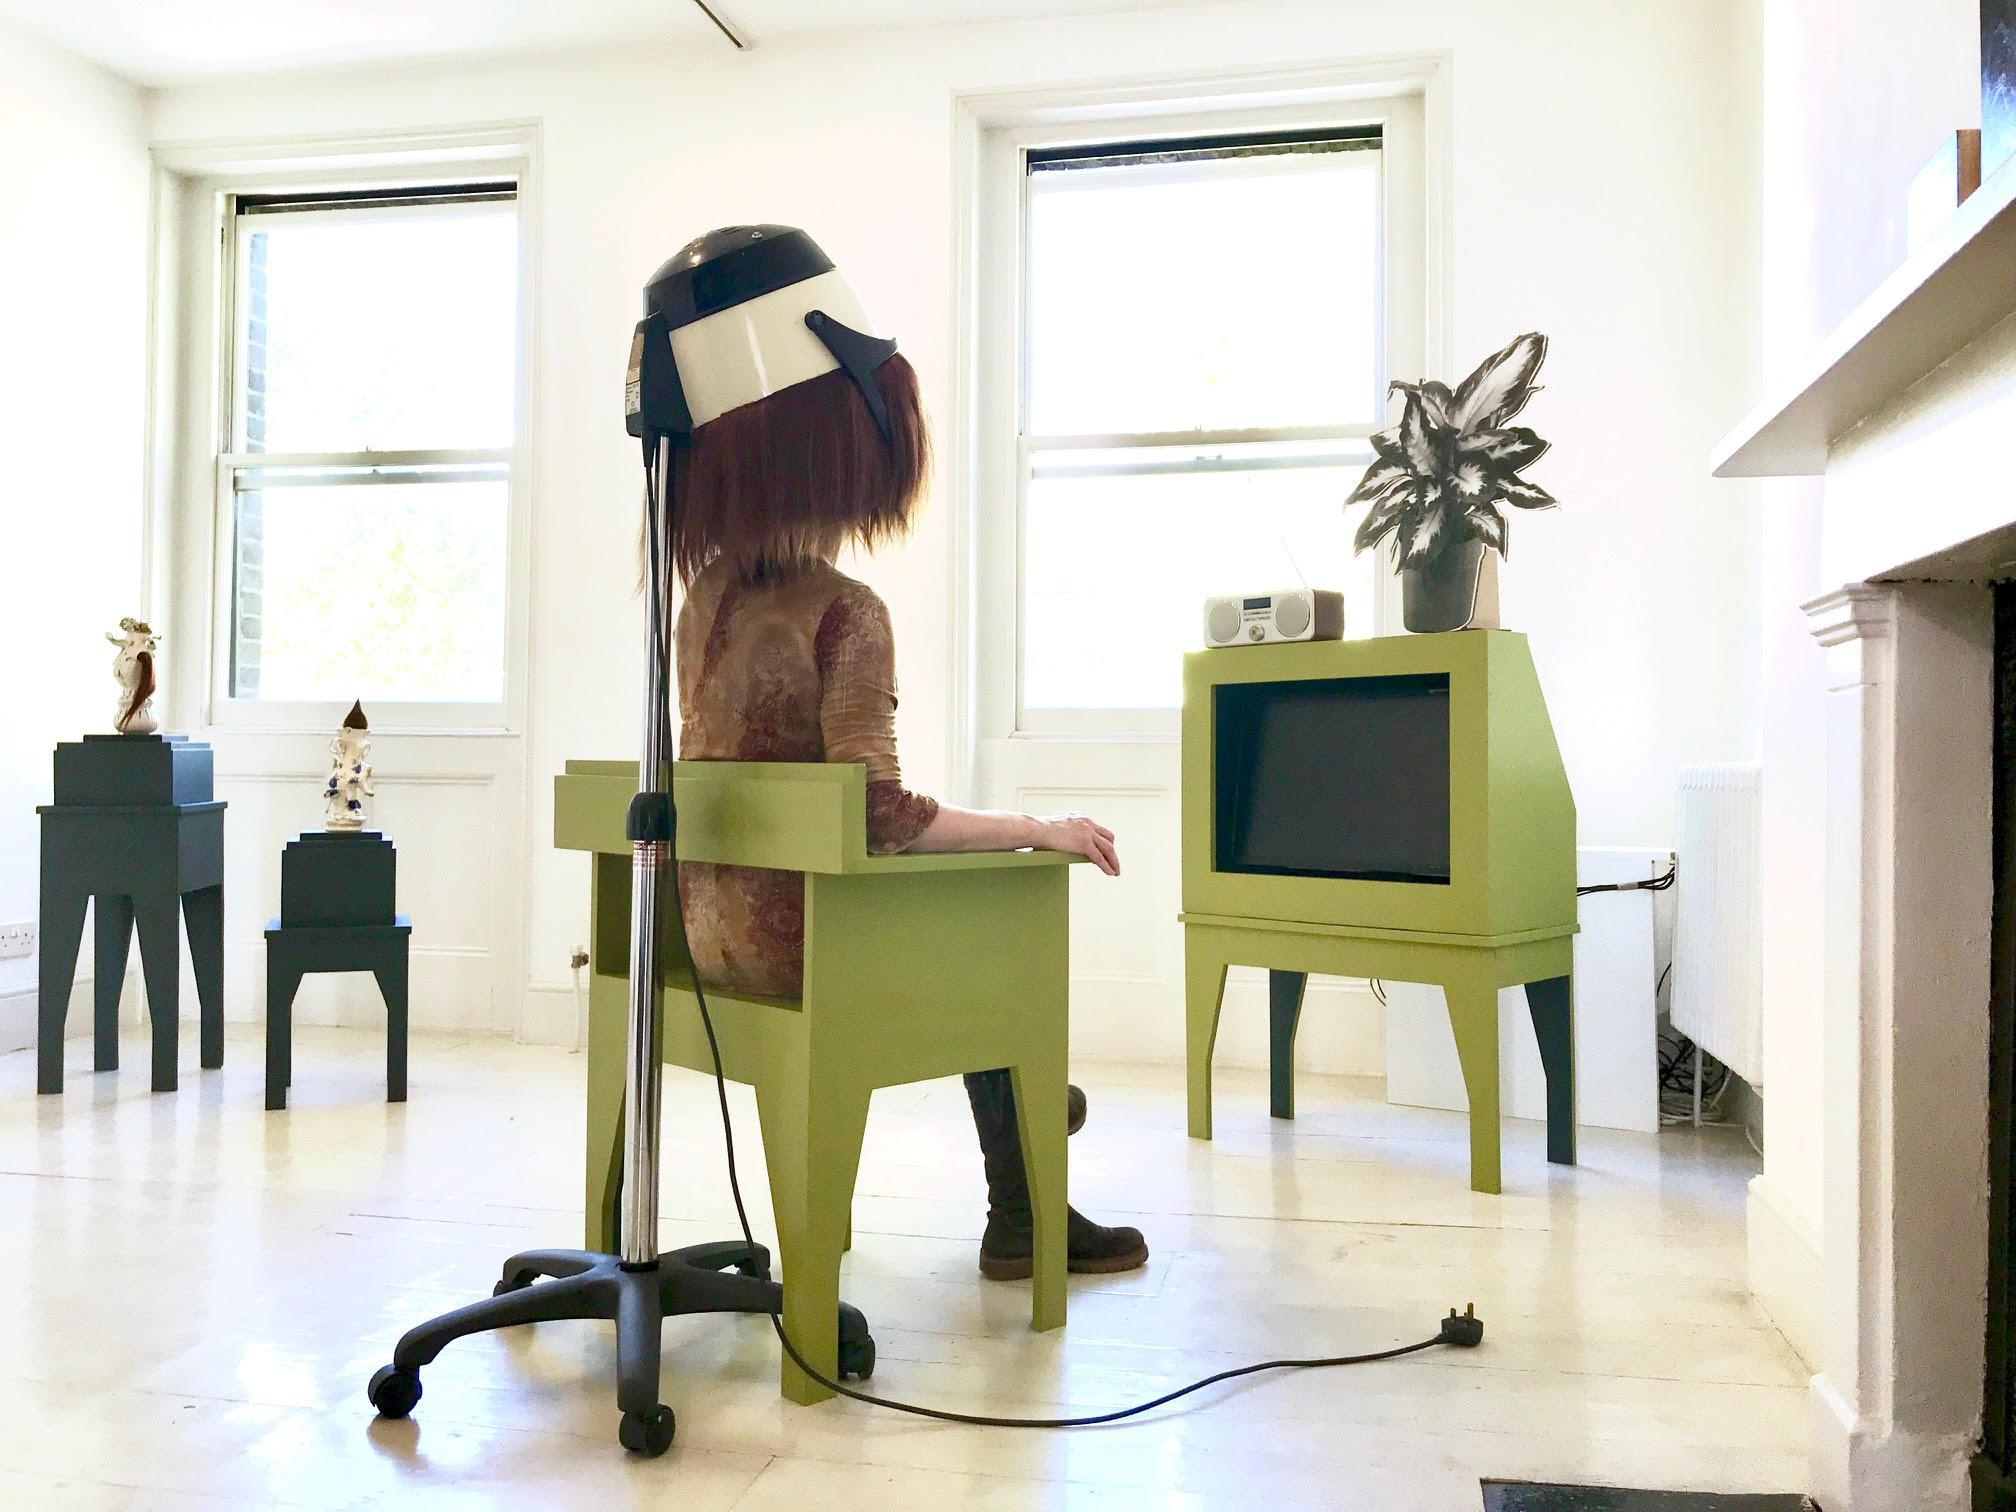 Hairy Dryer Unplugged (photo curtesy Ariane Madden Neale)